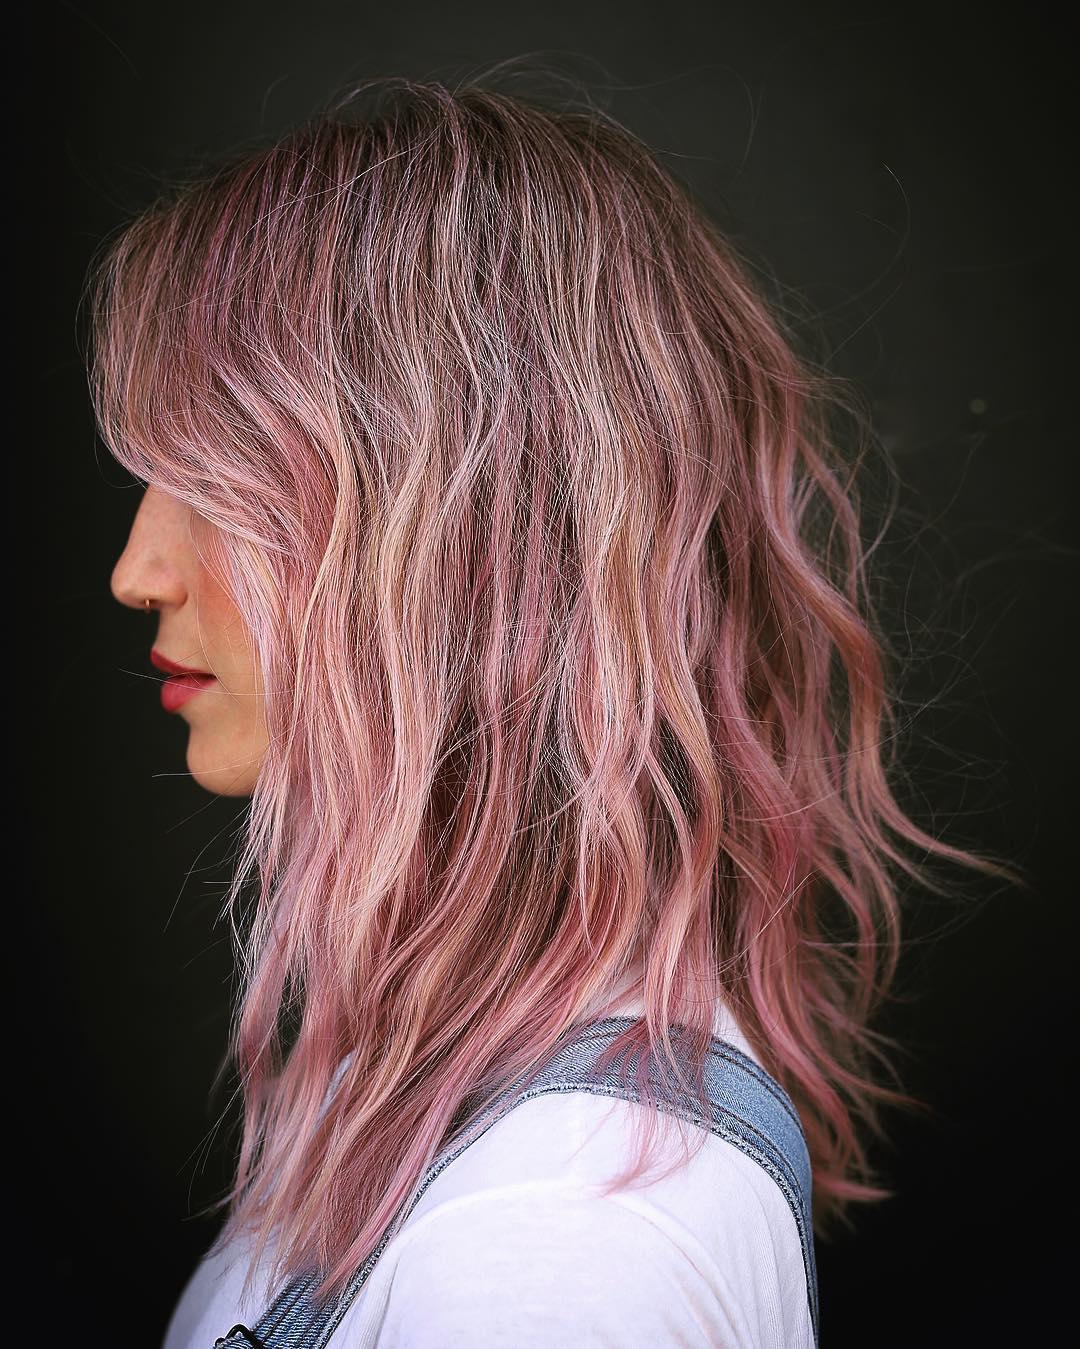 balayage ombre hair color ideas 7 10 Amazing Ombré and Balayage Hair Color Ideas